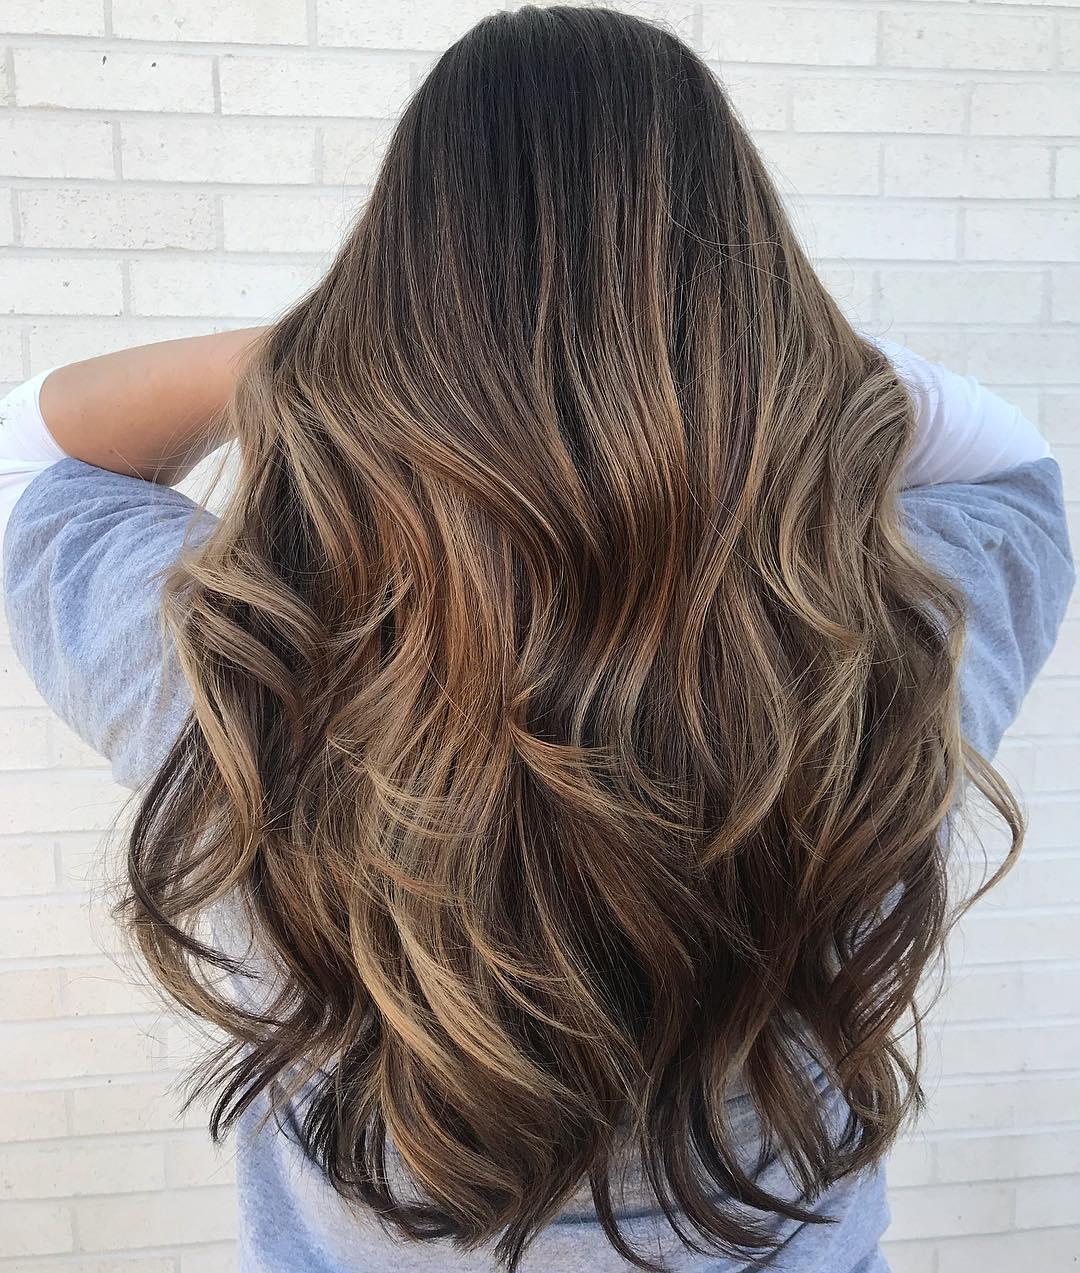 Waist-Length Wavy Brown Balayage Hair